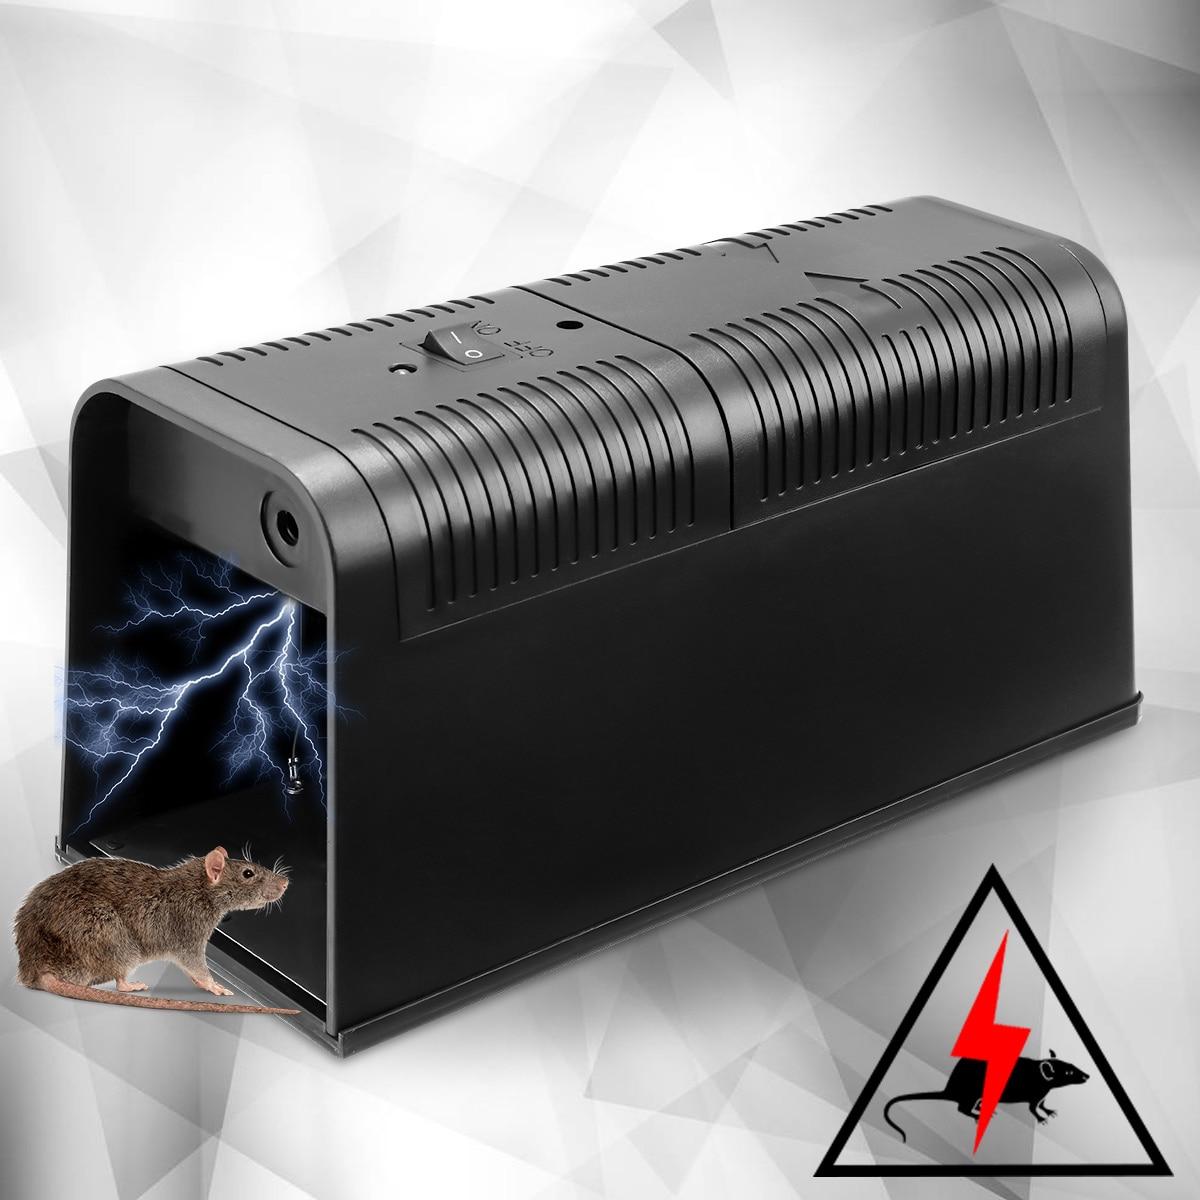 Elektronische Maus Mörder Ratte Zapper Exterminator Falle Humane Nagetier Mausefalle Gerät 235X102X113mm DC6V